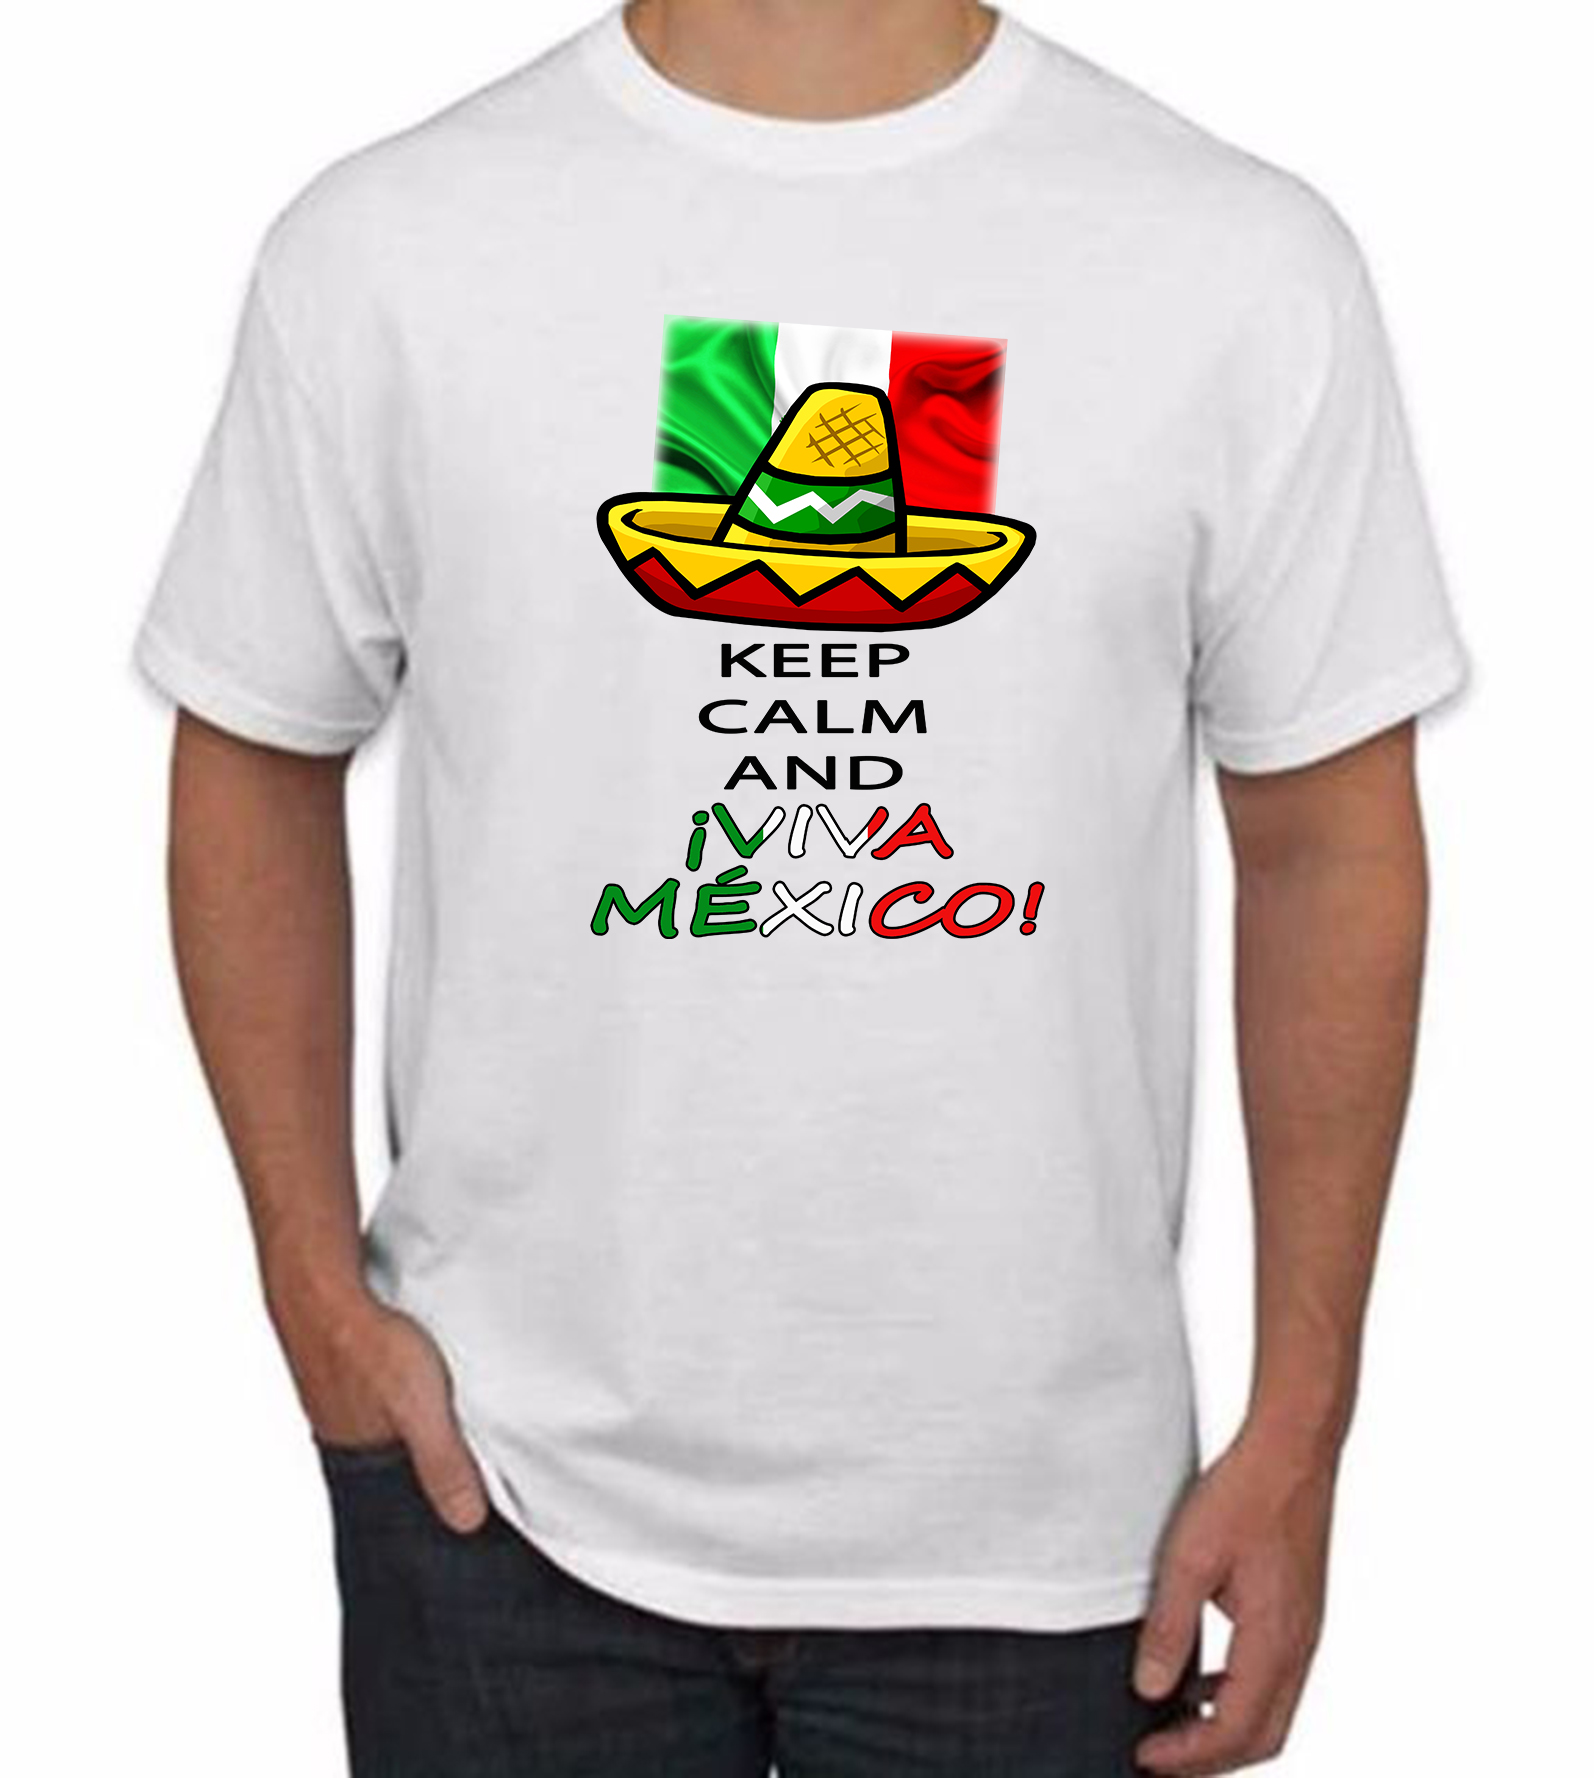 75eb2d6ac1a71 Playera Mexico num. 102 - SERVIMICH MORELIA